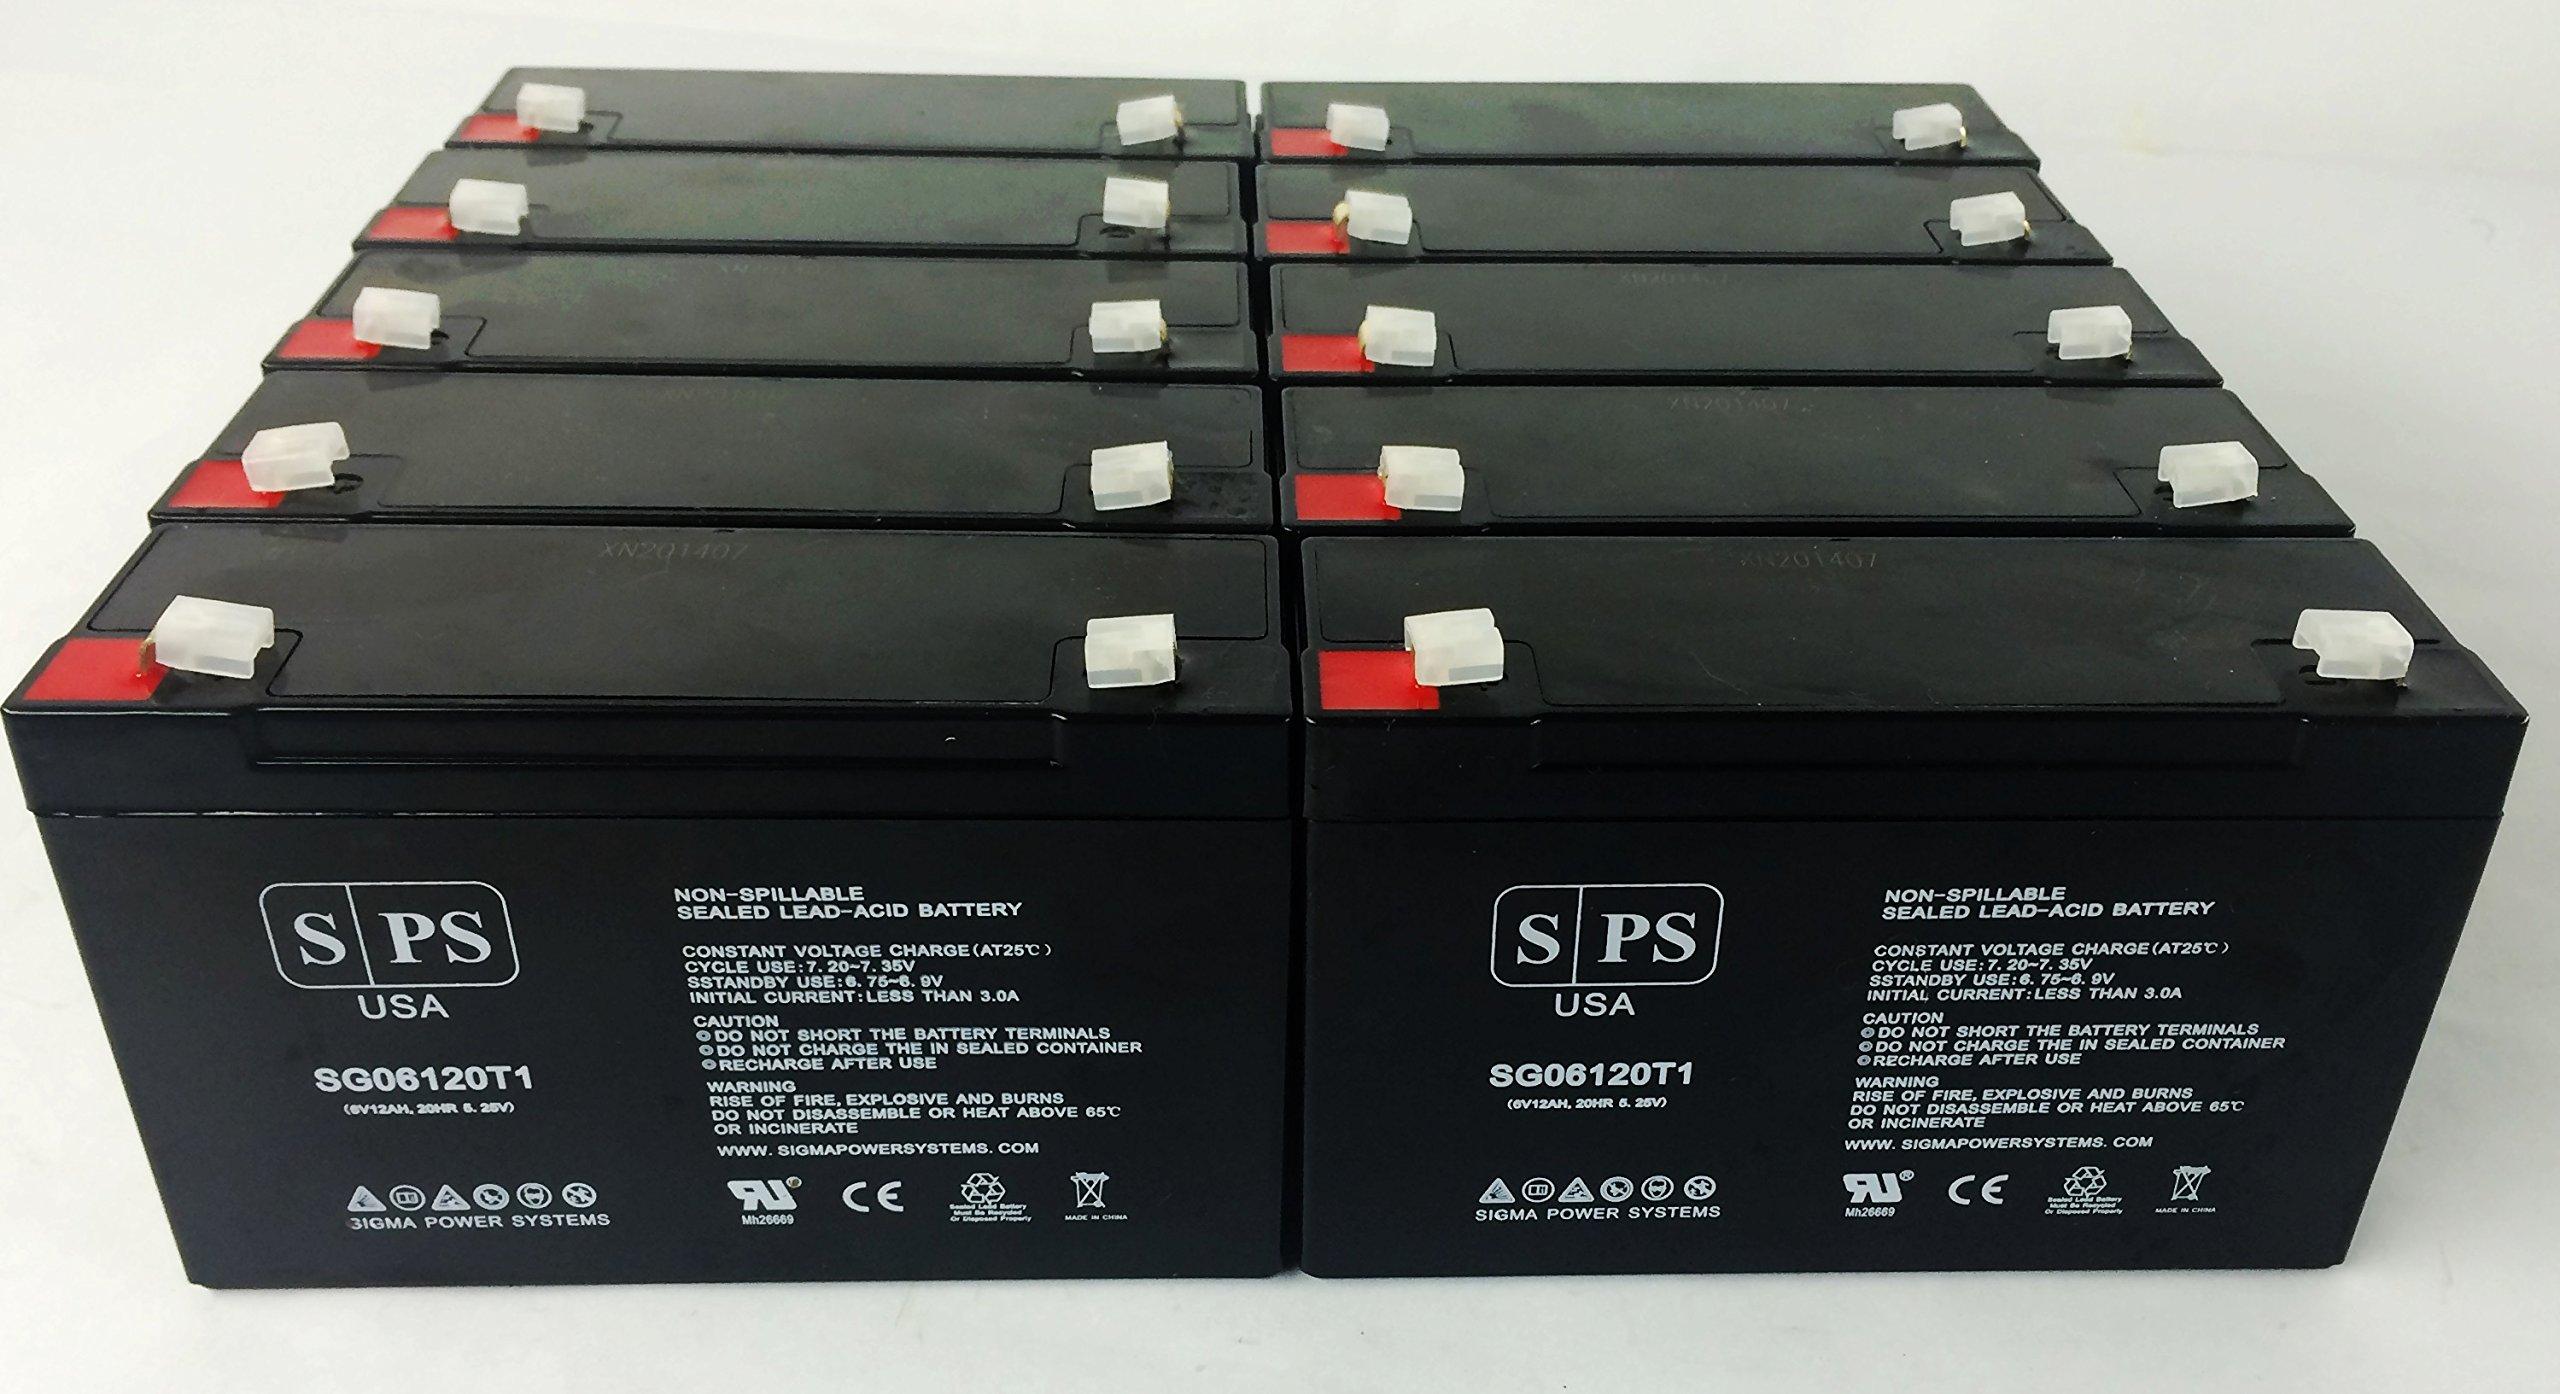 6V 12Ah Ritar RT6120, RT 6120 6V 12Ah UPS Replacement Battery - SPS BRAND (10 Pack)